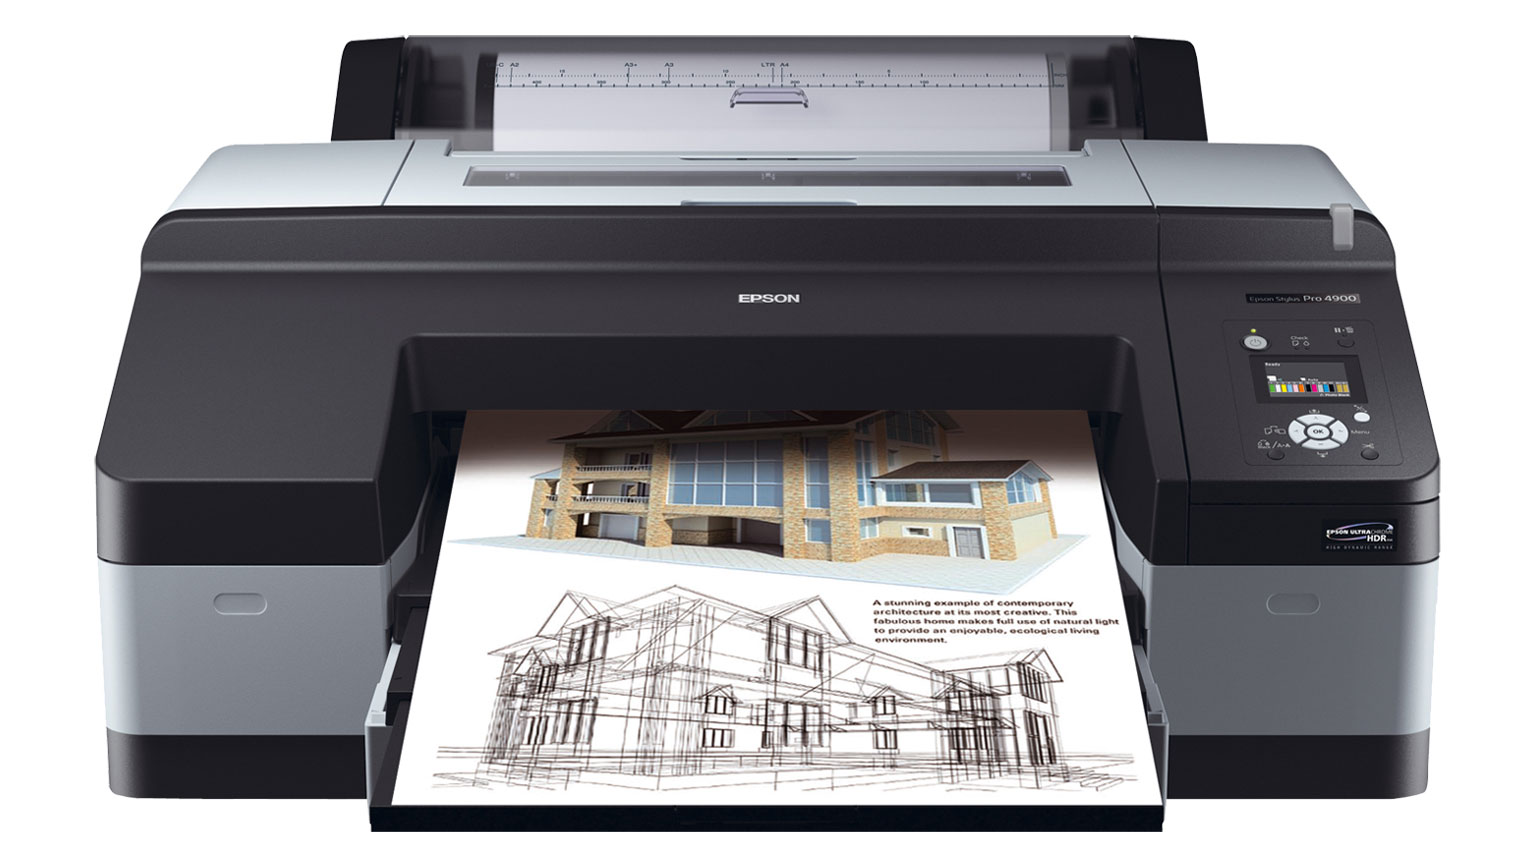 Three high-end printers for serious work - Epson Stylus Pro 4900